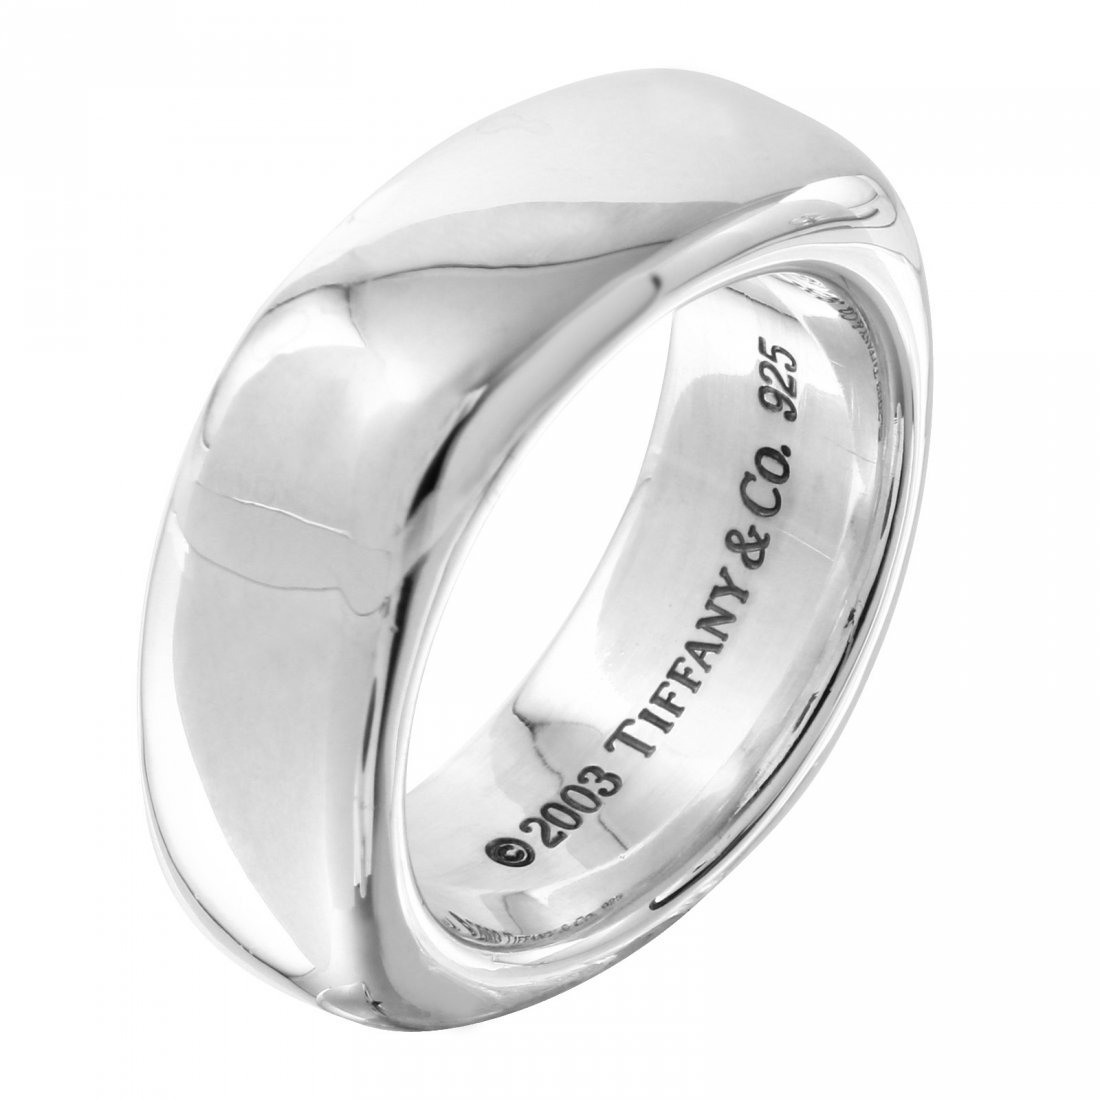 Tiffany and Co: Square Cushion Band Ring